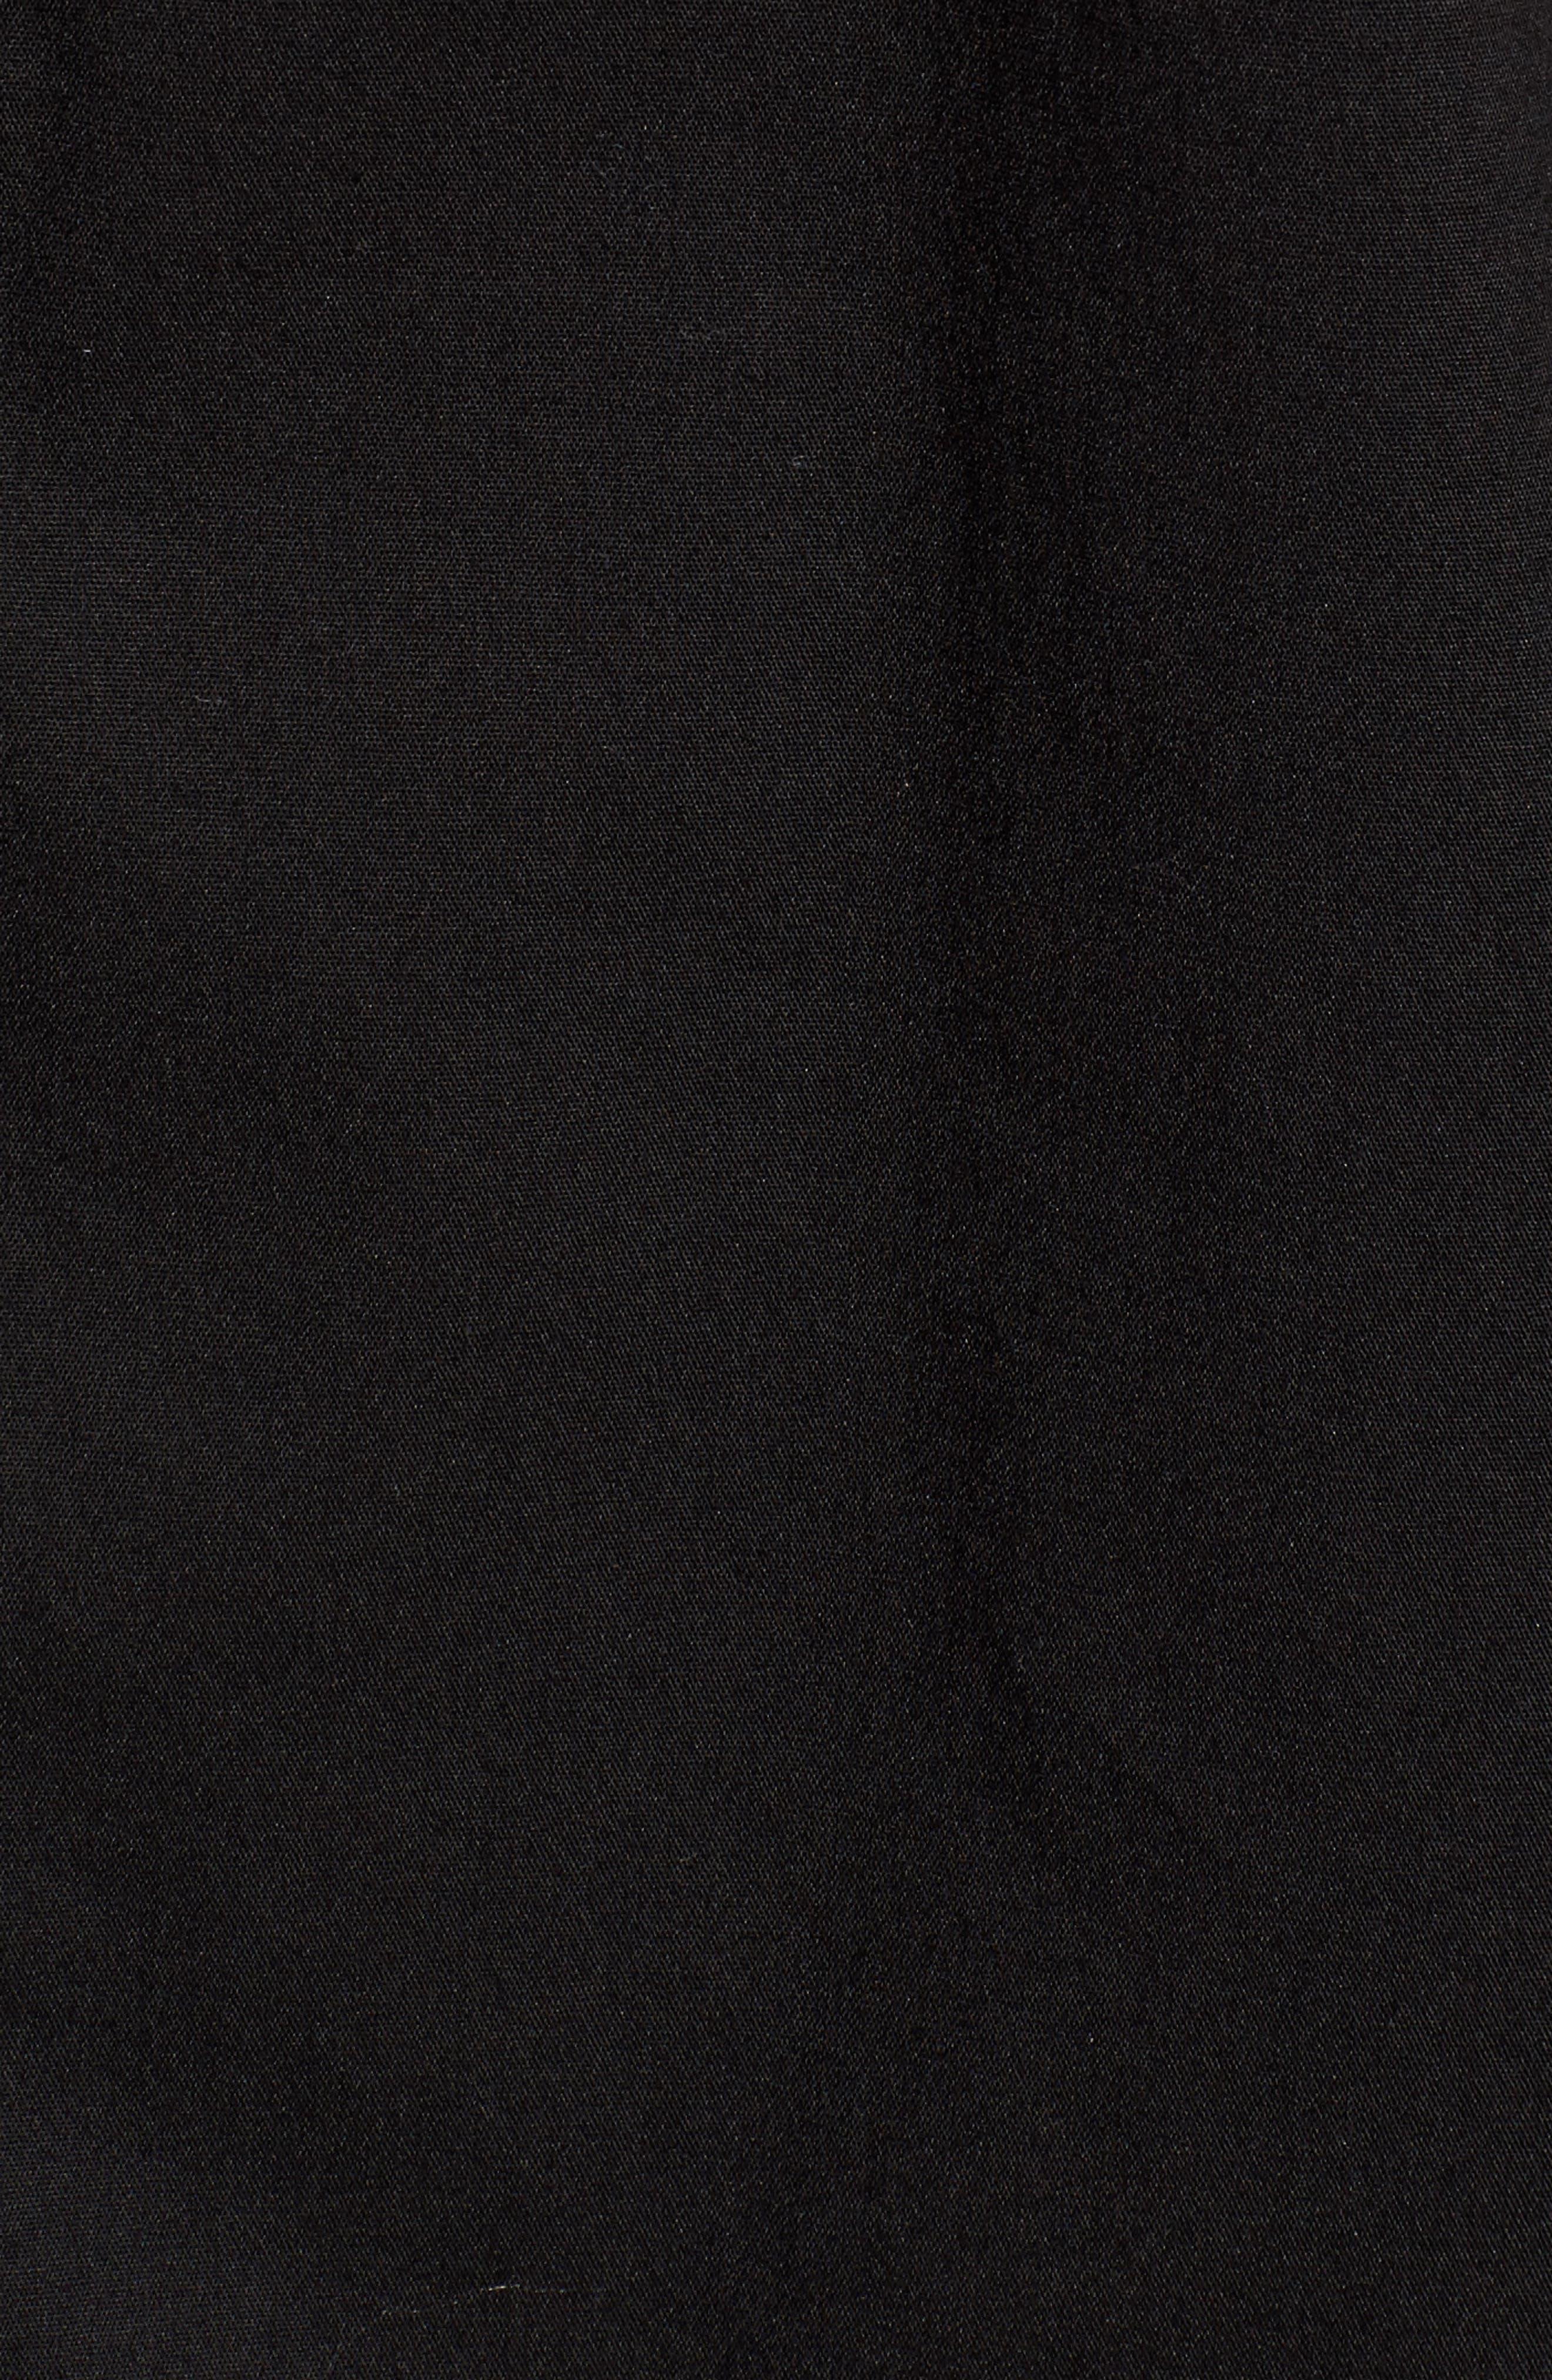 Ruffle Sleeve Tunic,                             Alternate thumbnail 5, color,                             001